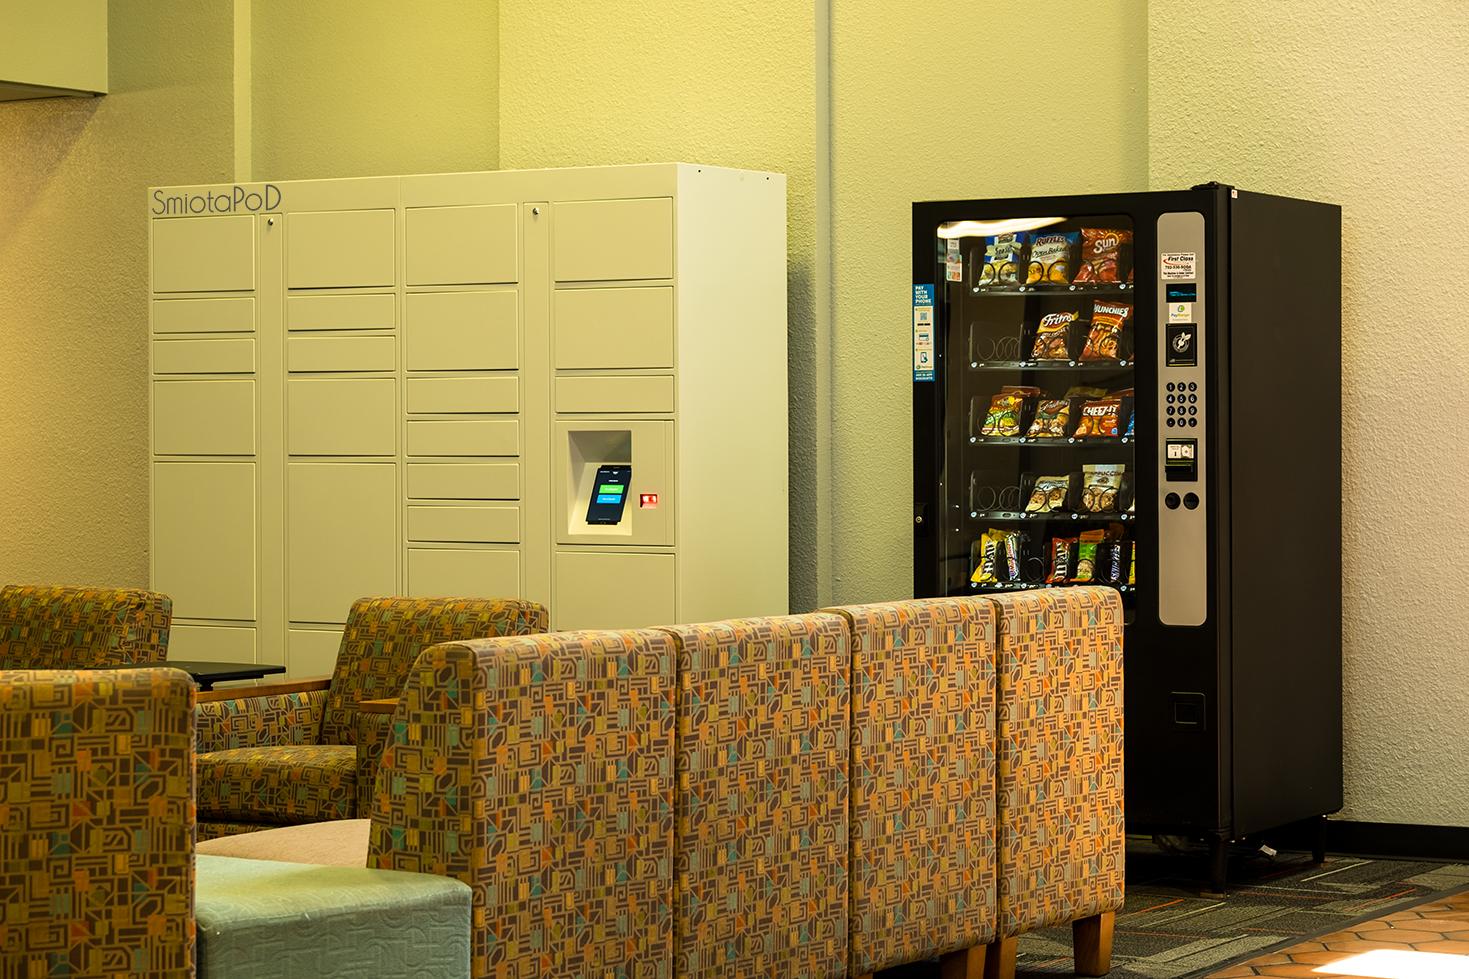 UNLV Student Residence Halls Integrates Smiota's Package Lockers